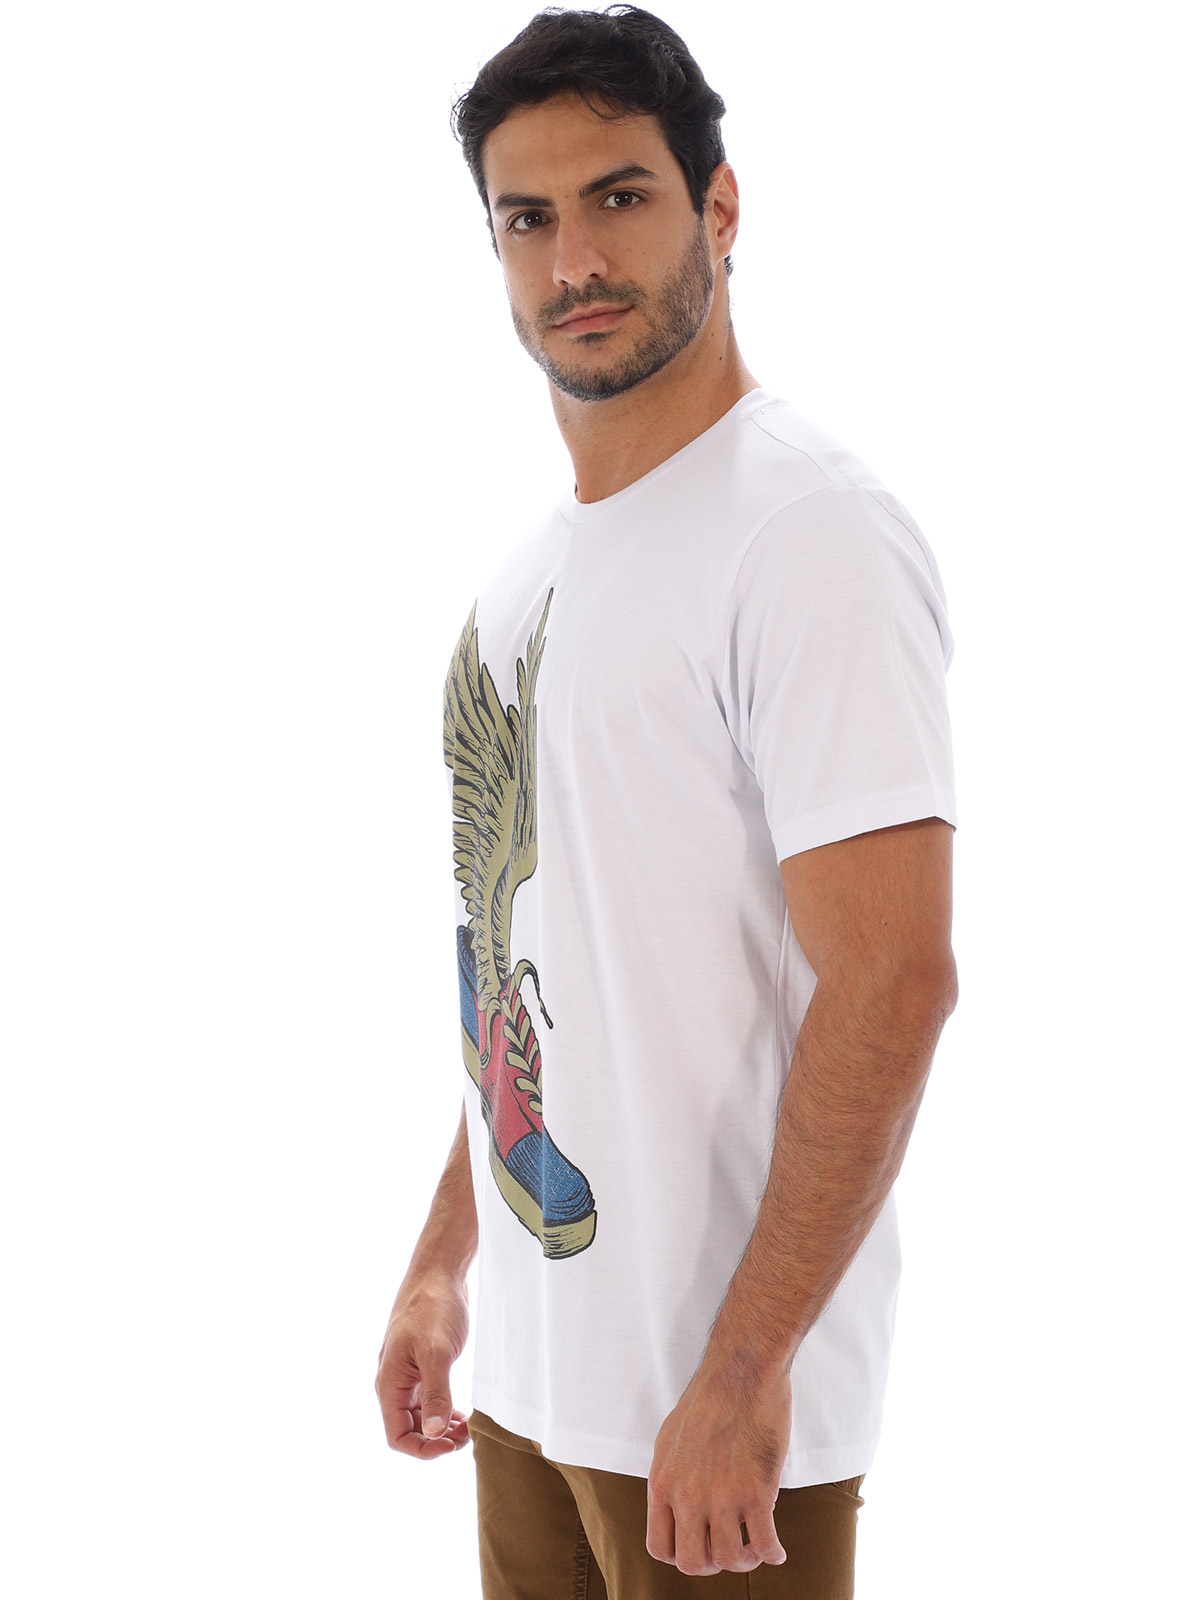 Camiseta Masculina Básica Algodão Estampa Sneakears Branco